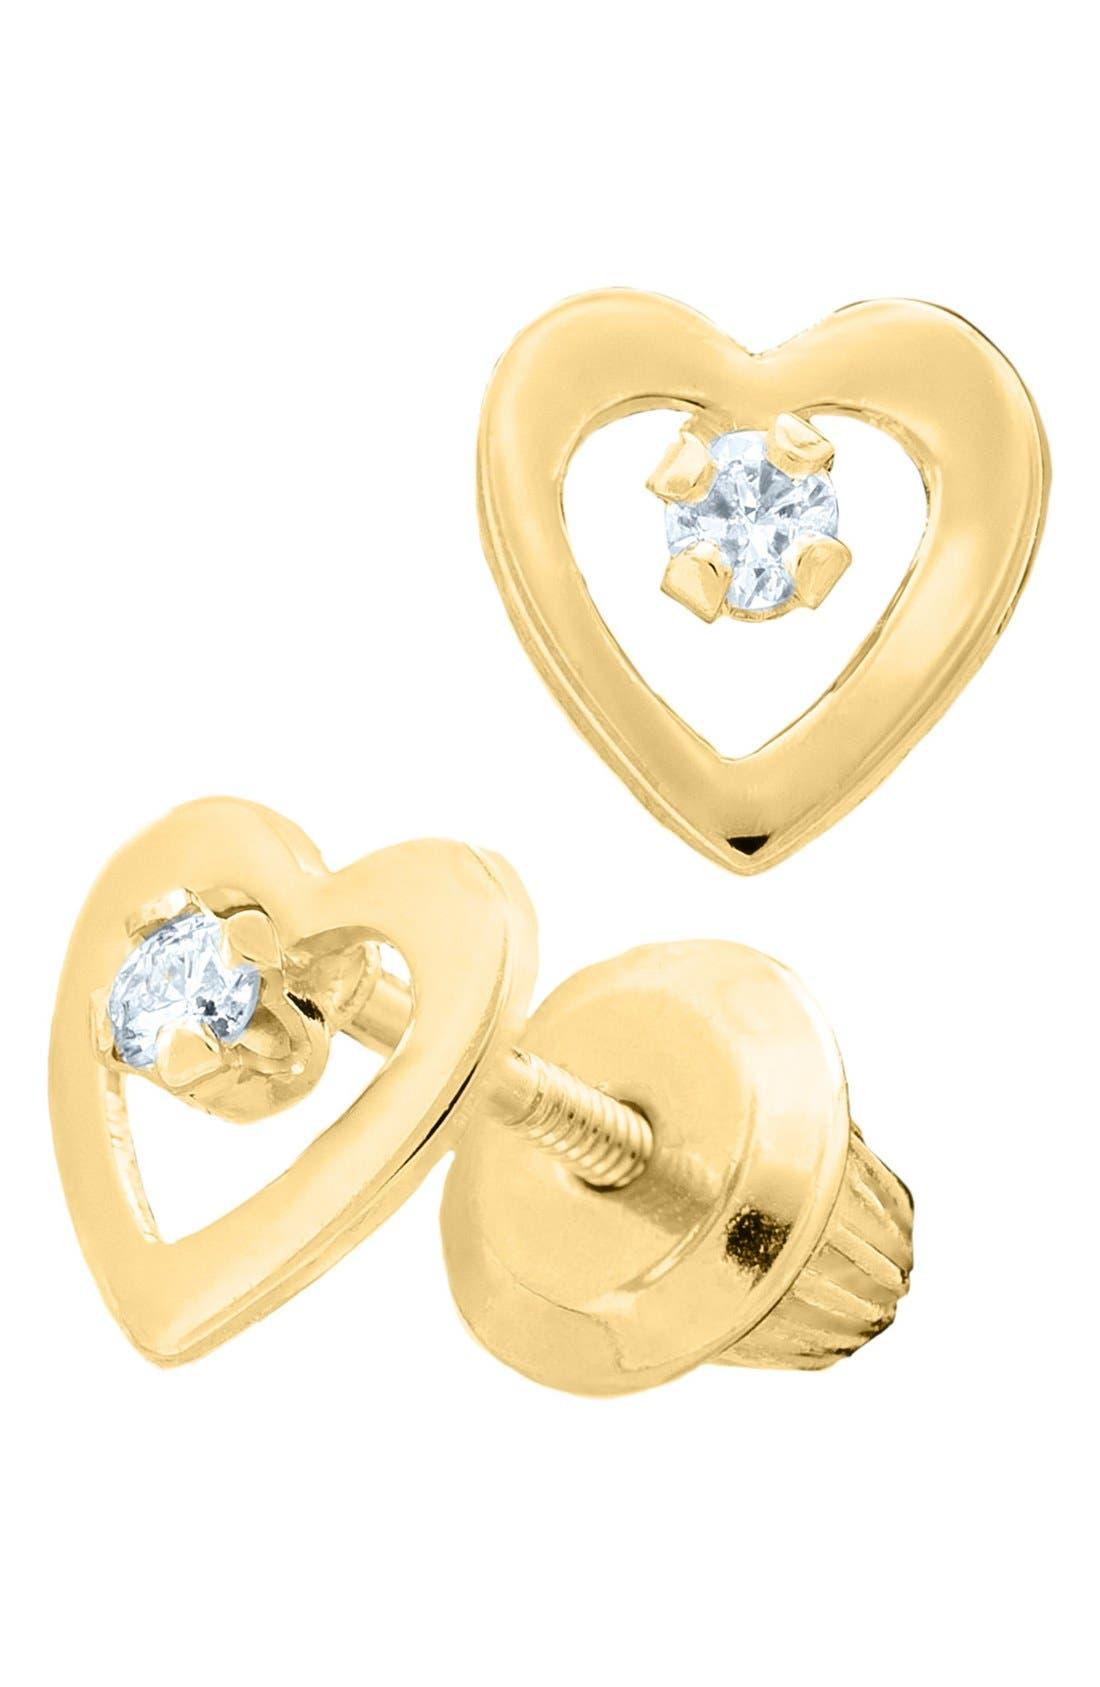 14k Yellow Gold & Diamond Open Heart Earrings,                             Alternate thumbnail 2, color,                             GOLD